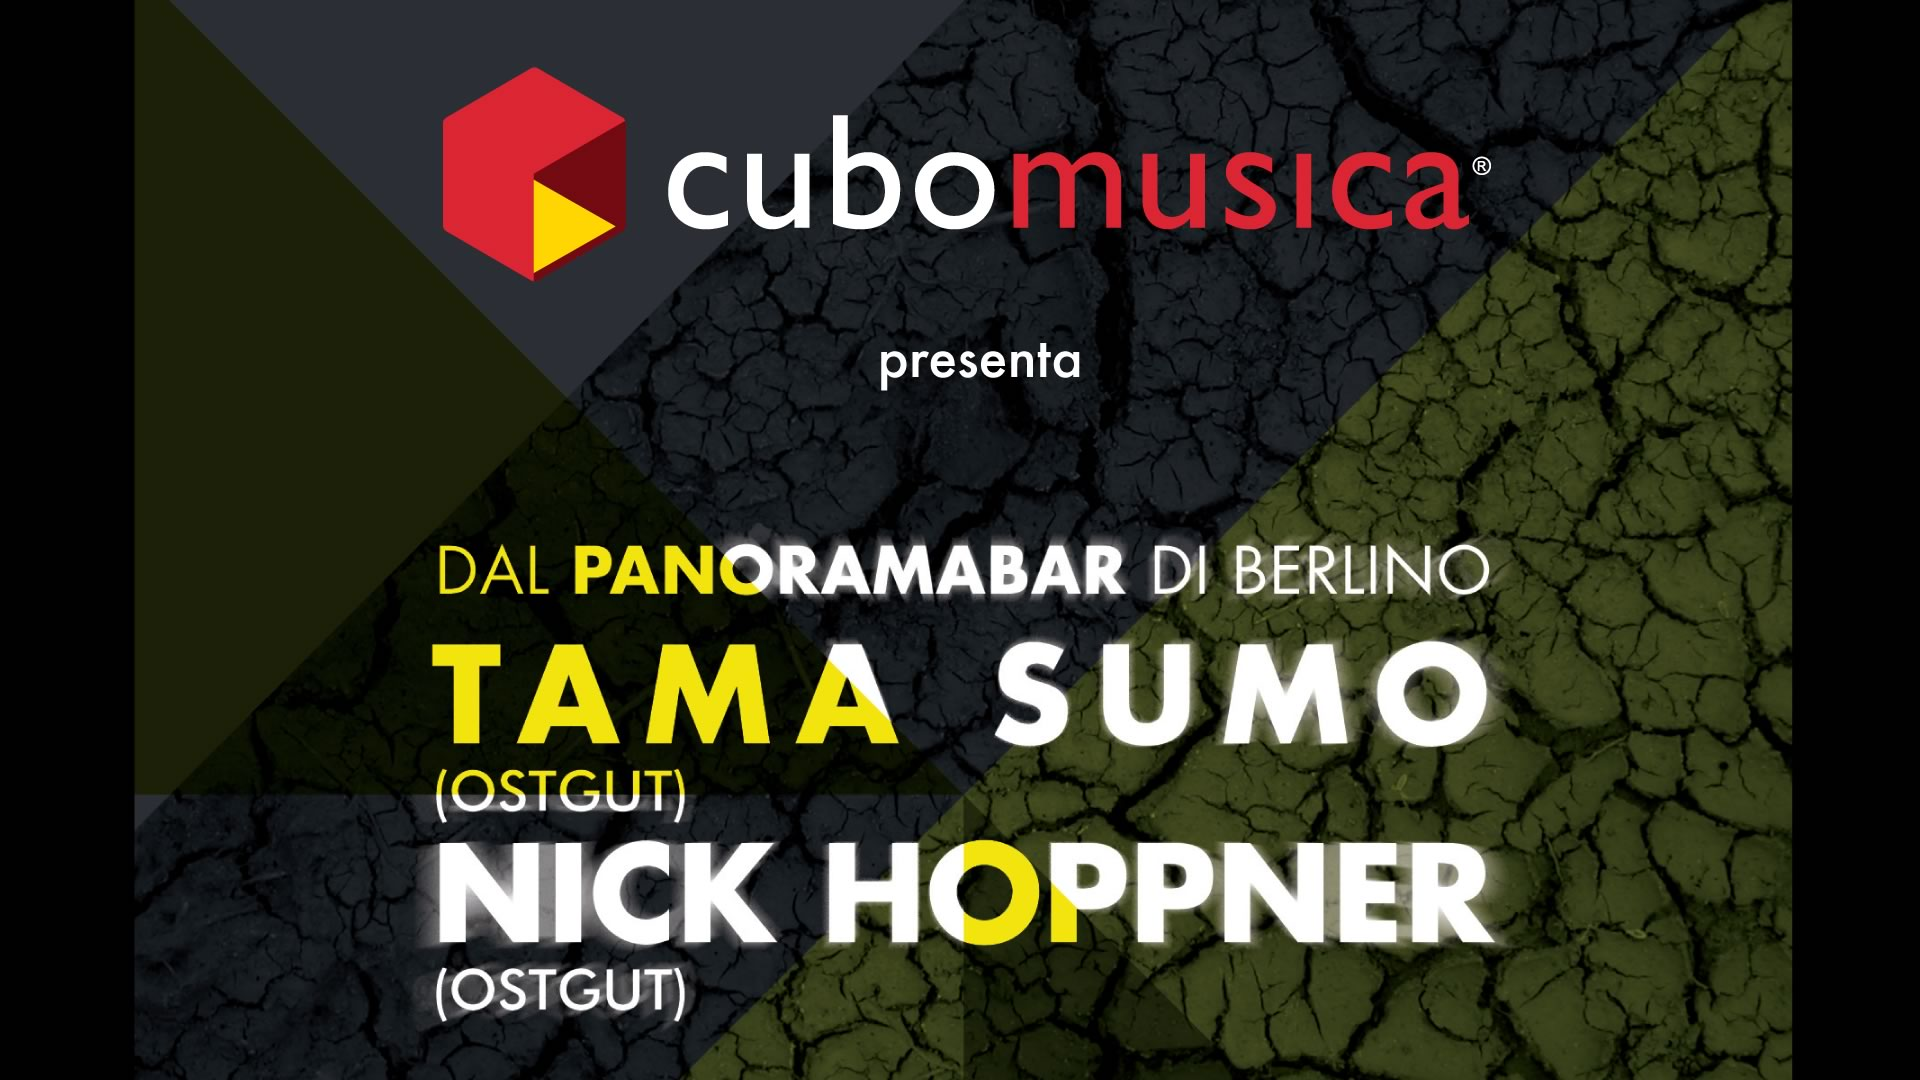 LPM 2013 Rome | CuboMusica: Tama Sumo & nd_baumecker